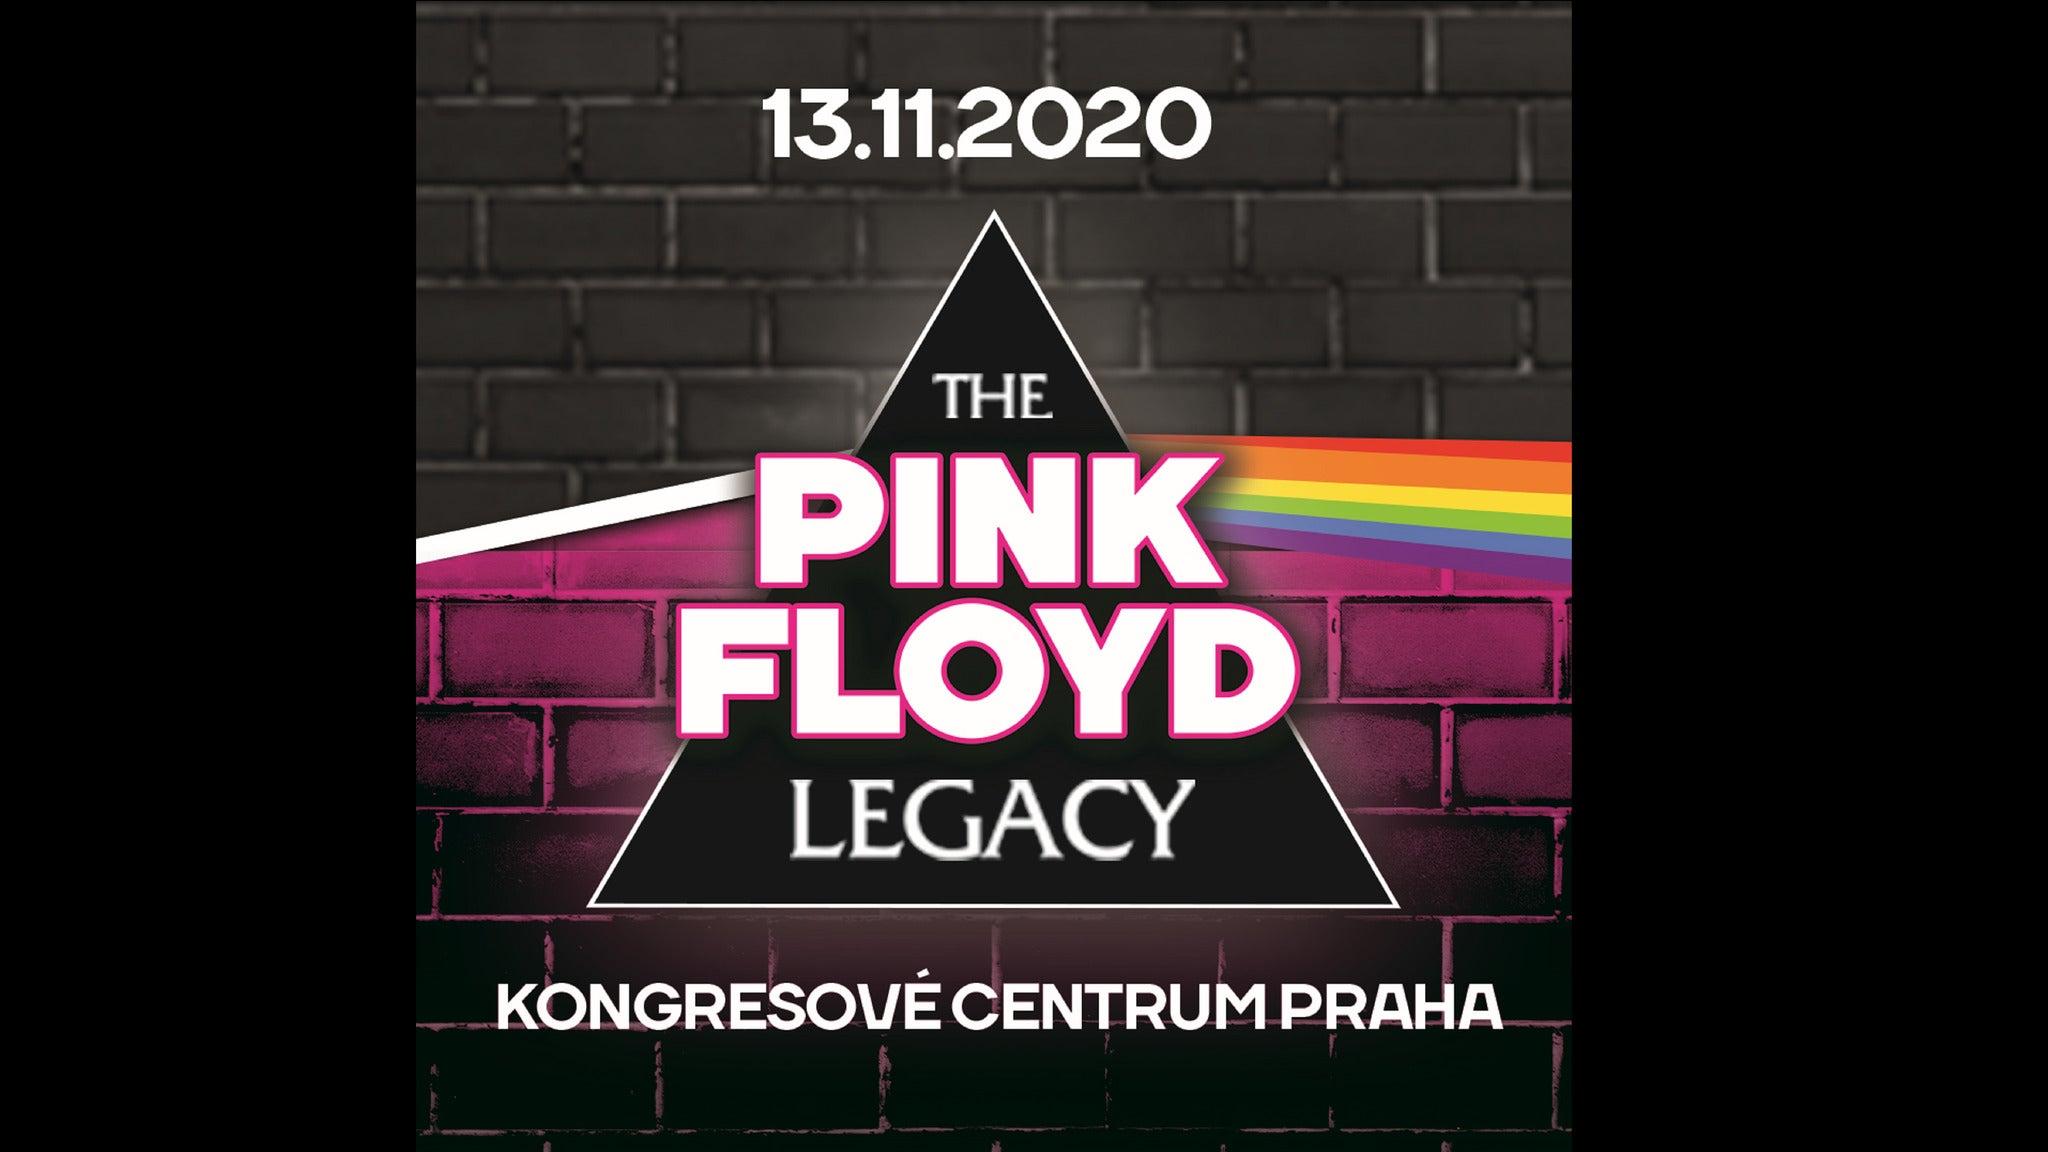 The Pink Floyd Legacy